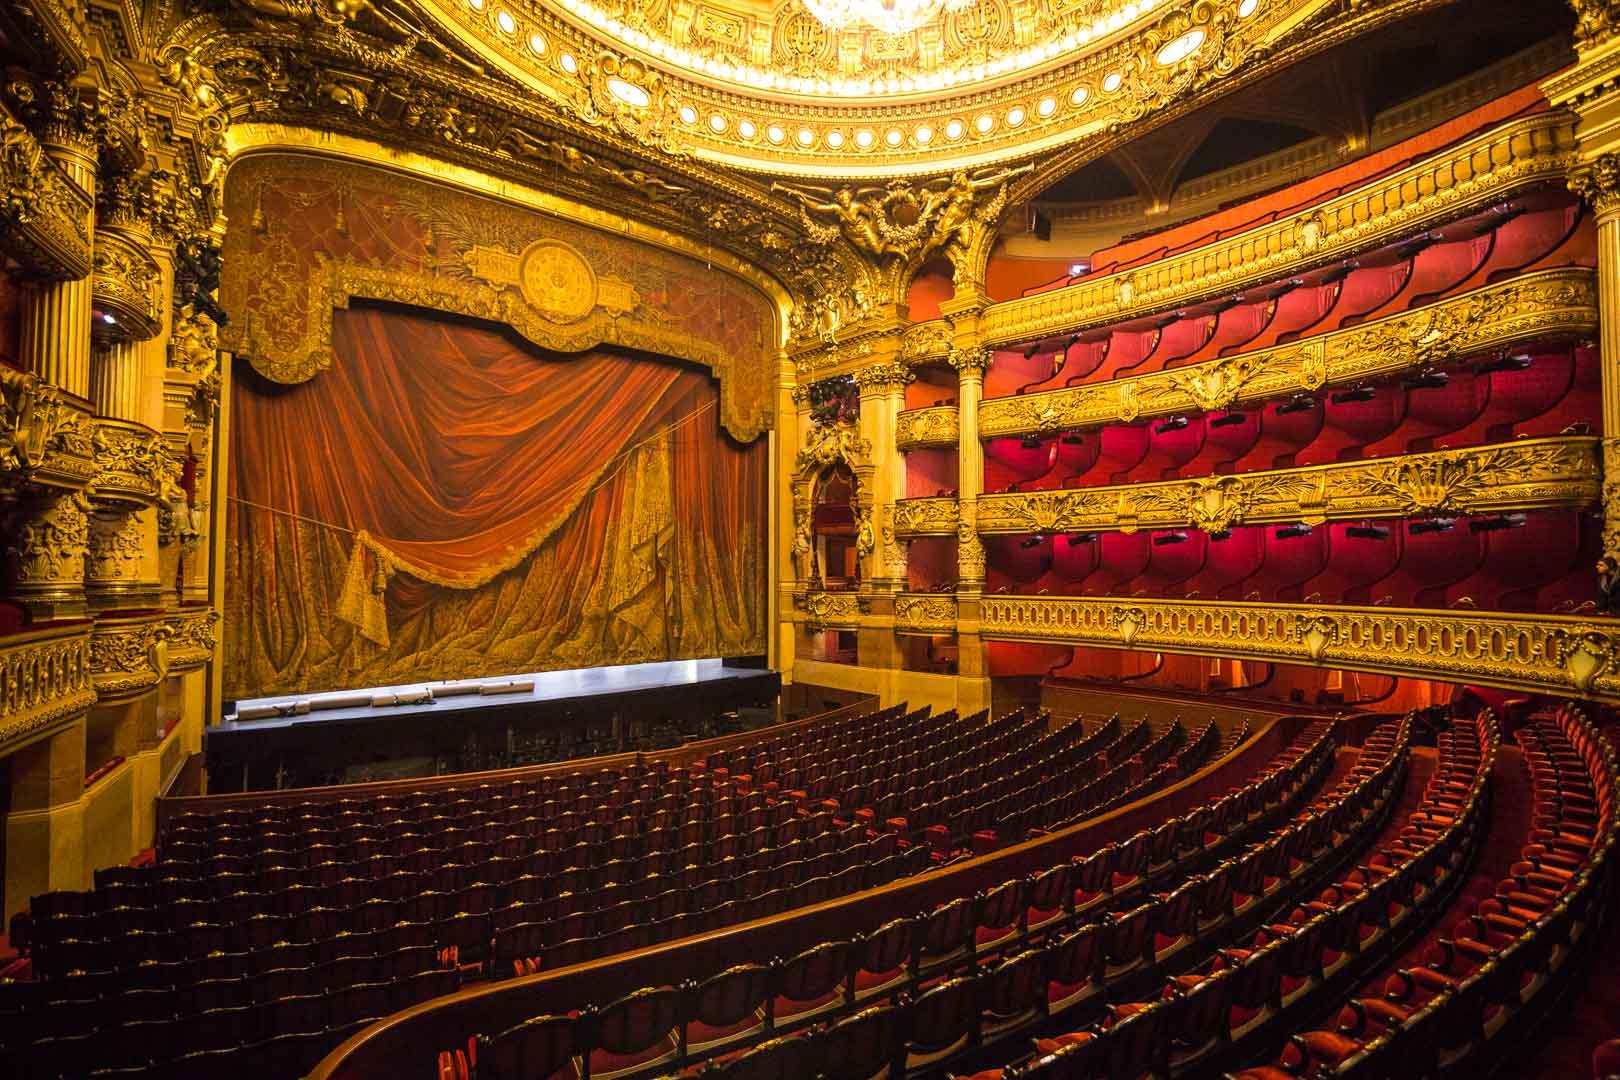 Opera Garnier - 5 Incredible Things to See Inside the